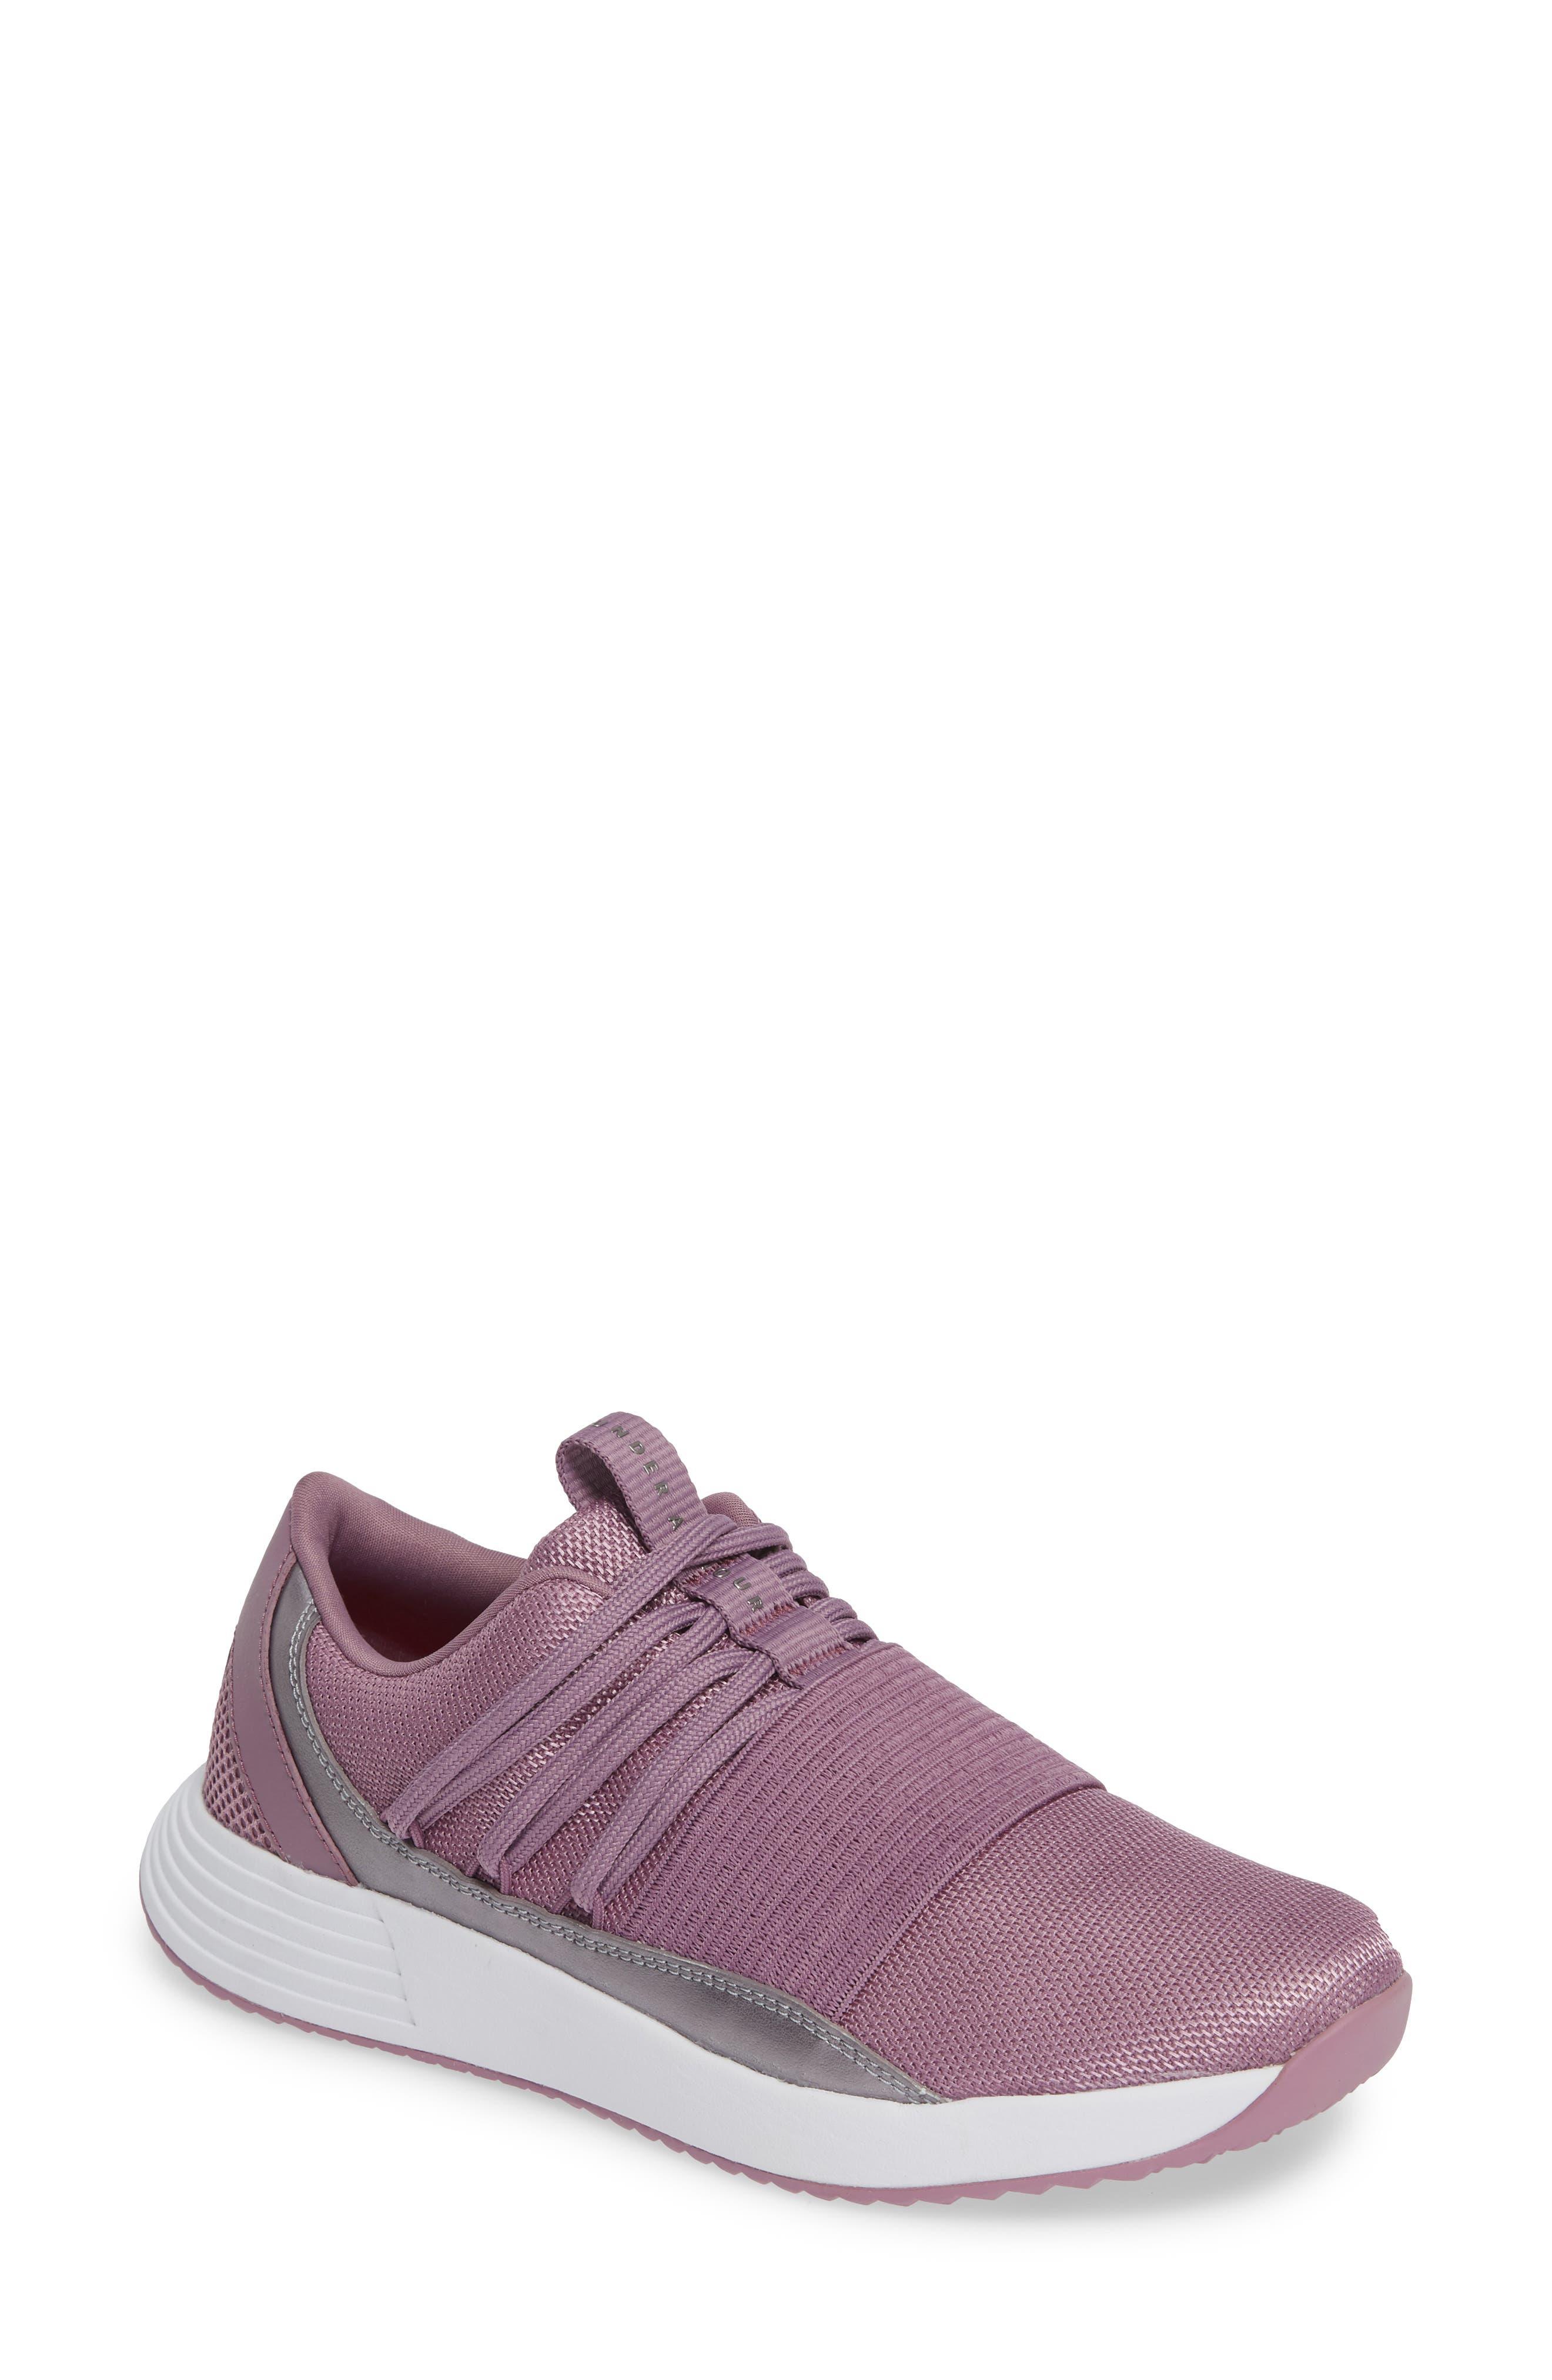 Breathe Lace X NM Sneaker,                             Main thumbnail 1, color,                             PURPLE PRIME/ WHITE/ WHITE